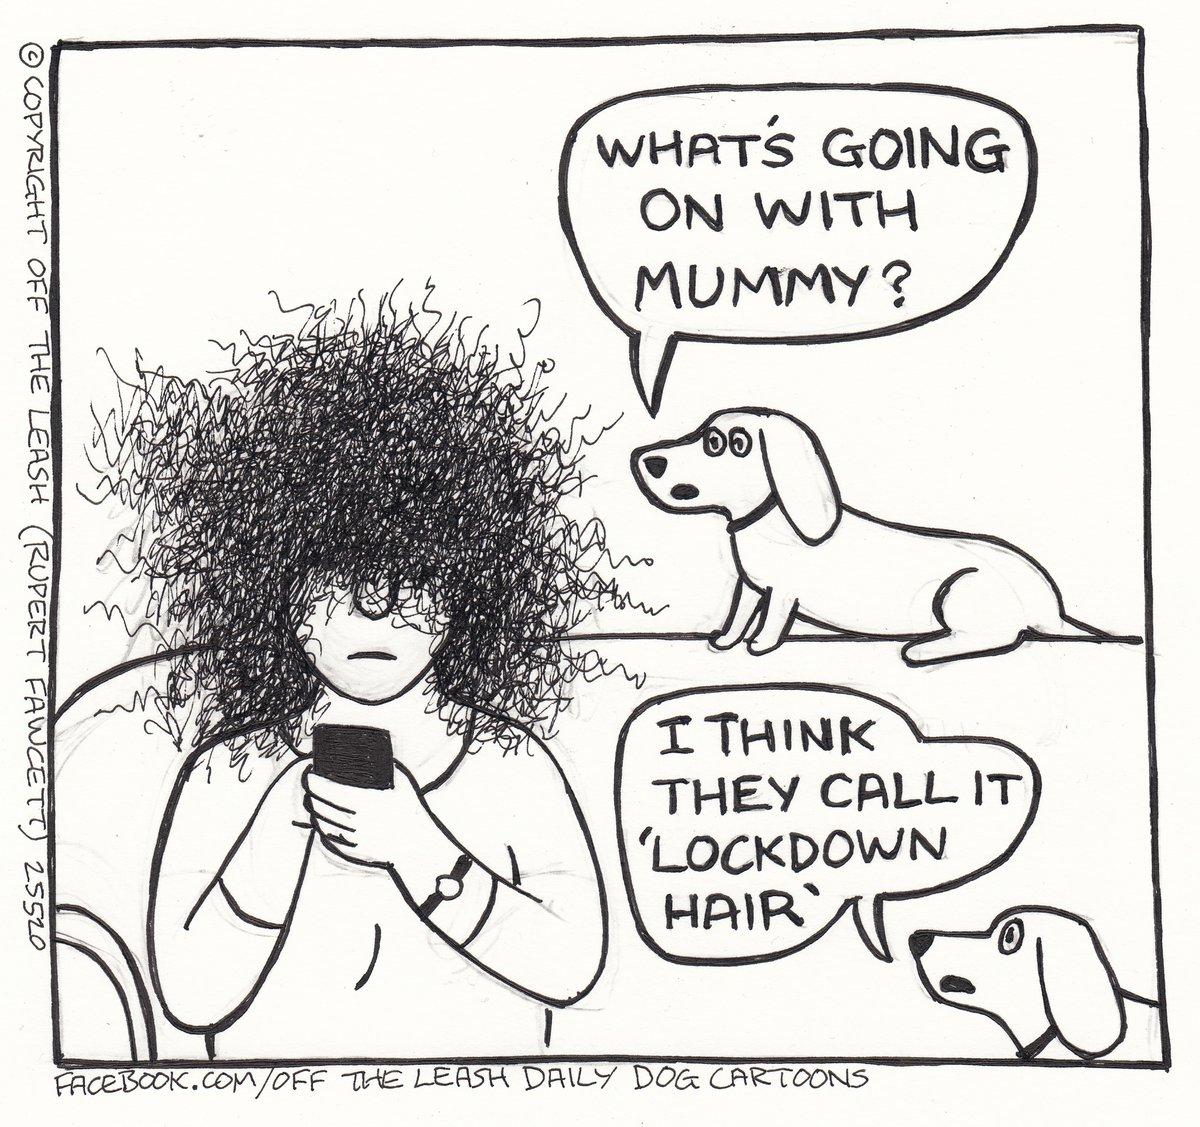 Bad Hair Day  #StayAlert #CoronavirusPandemic2020 #SaveTheDay #TheLockdown #HomeLife #LifeInLockdown #BadHairDaypic.twitter.com/m5bqdr6LHy